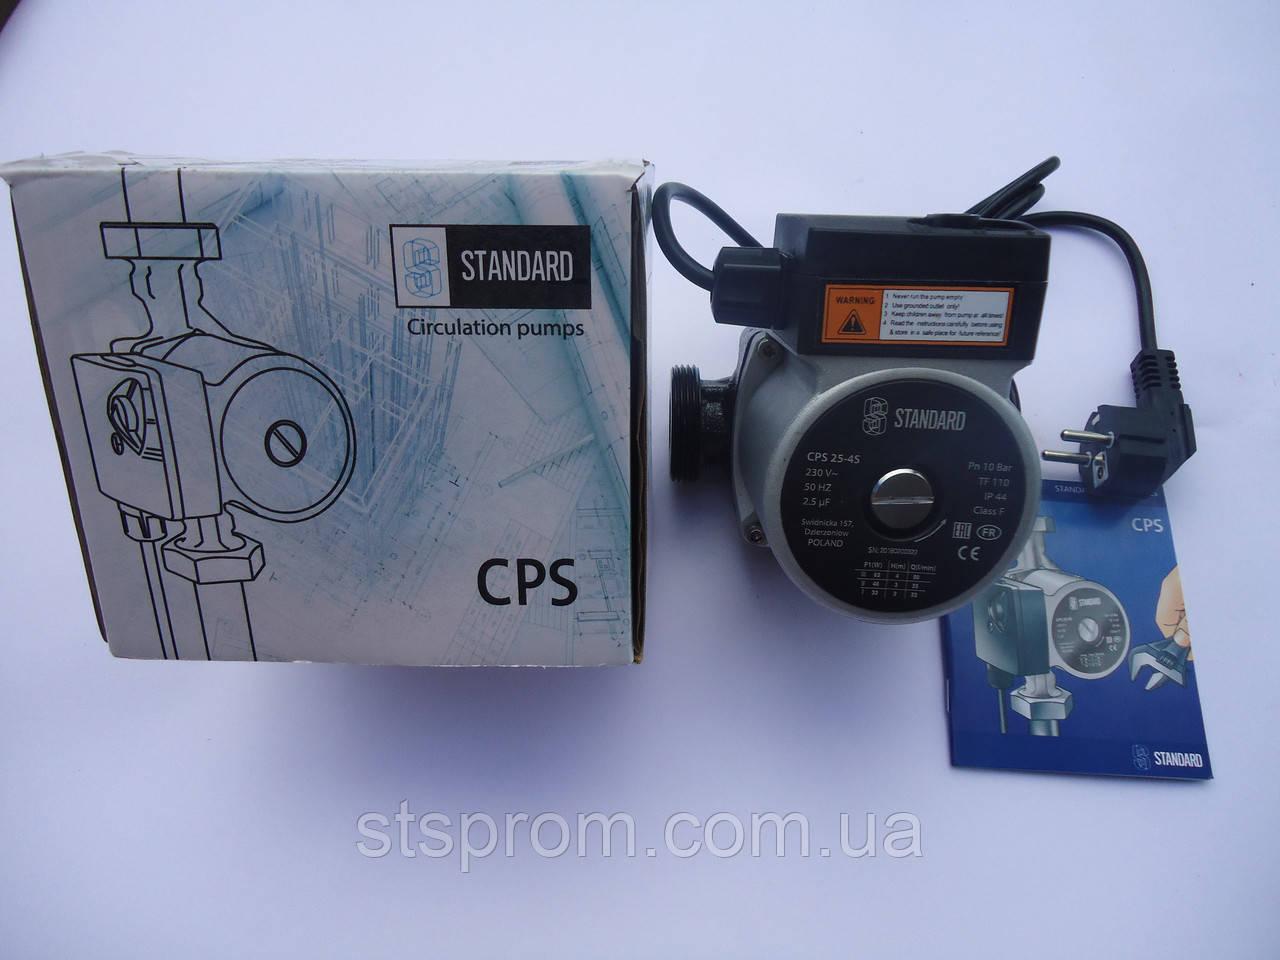 Циркуляционный насос  STANDARD CPS 25-4S - 180, Стандарт (Польша)